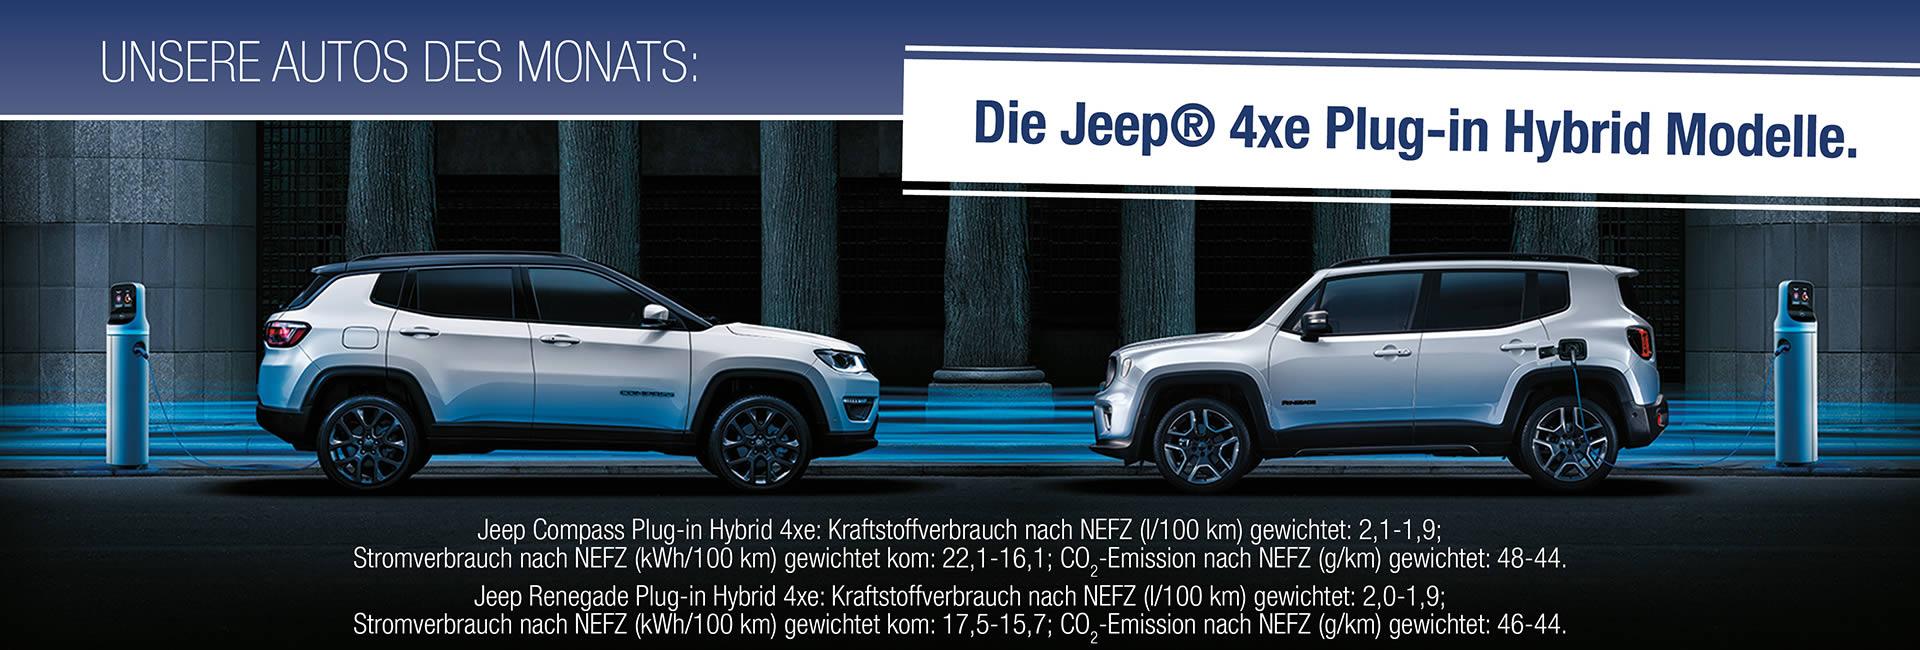 Auto des Monats 09-2020 Jeep® Renegade 4xe und Jeep® Compass 4xe mit Plug-in-Hybrid